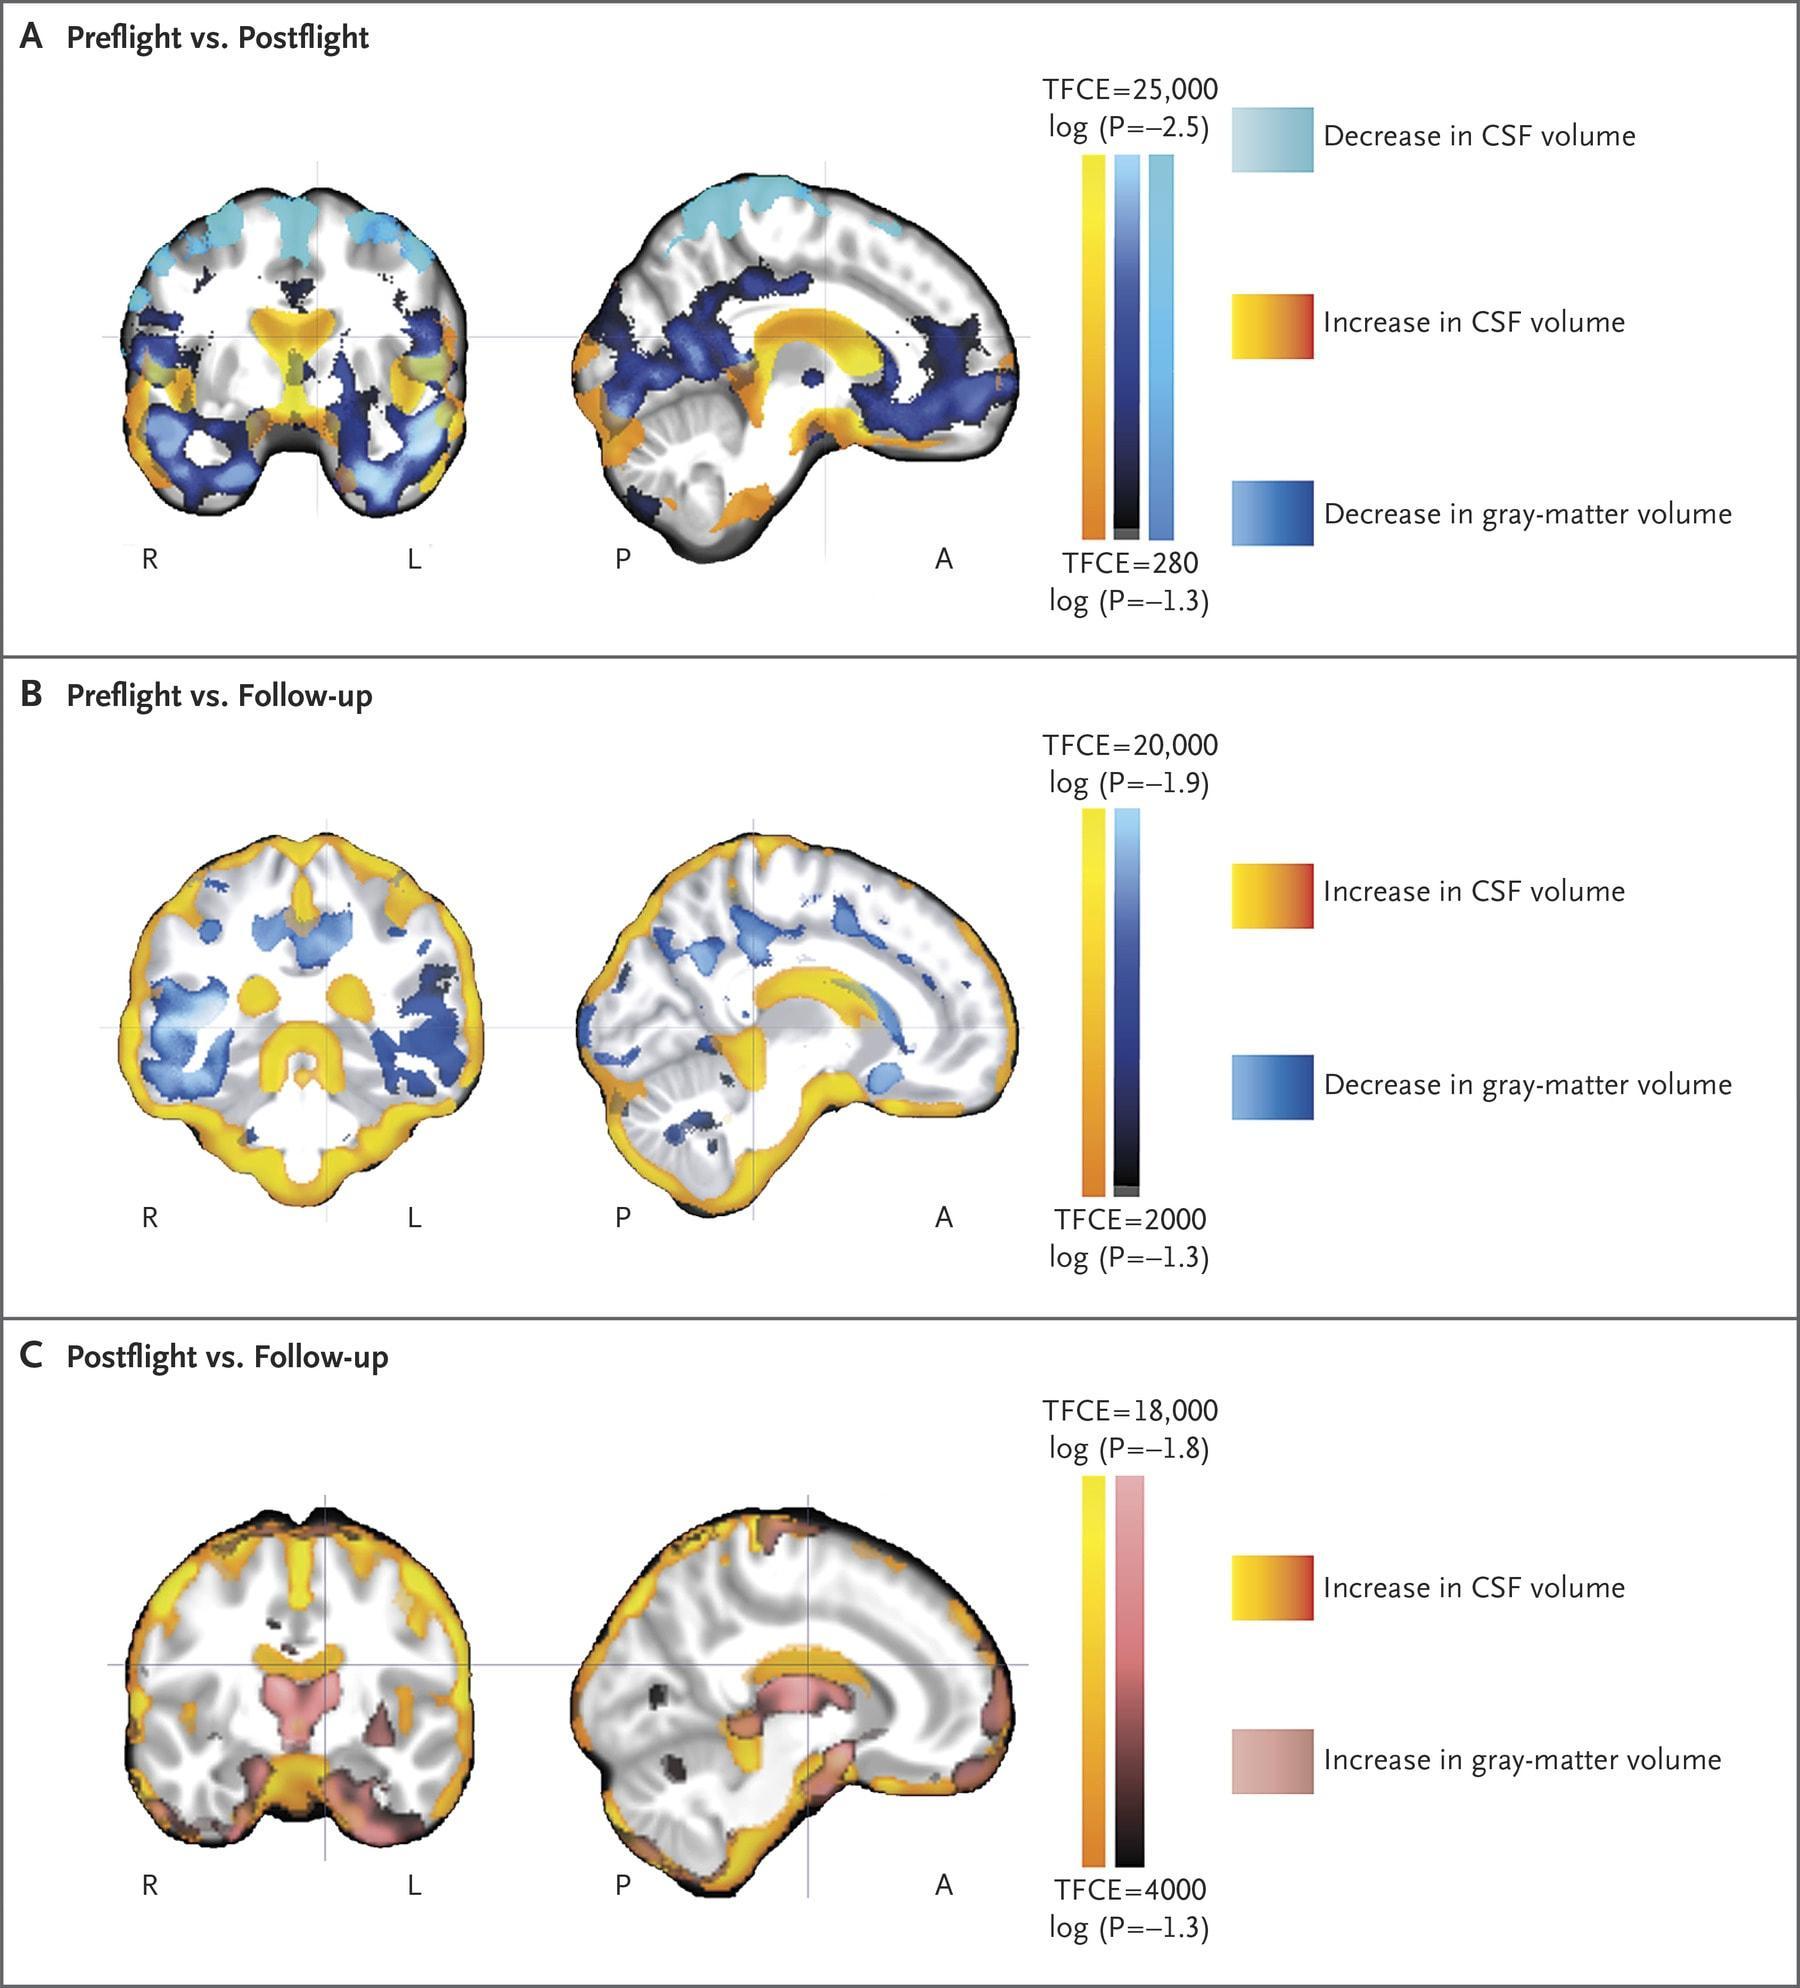 Микрогравитация повлияла на объем веществ головного мозга